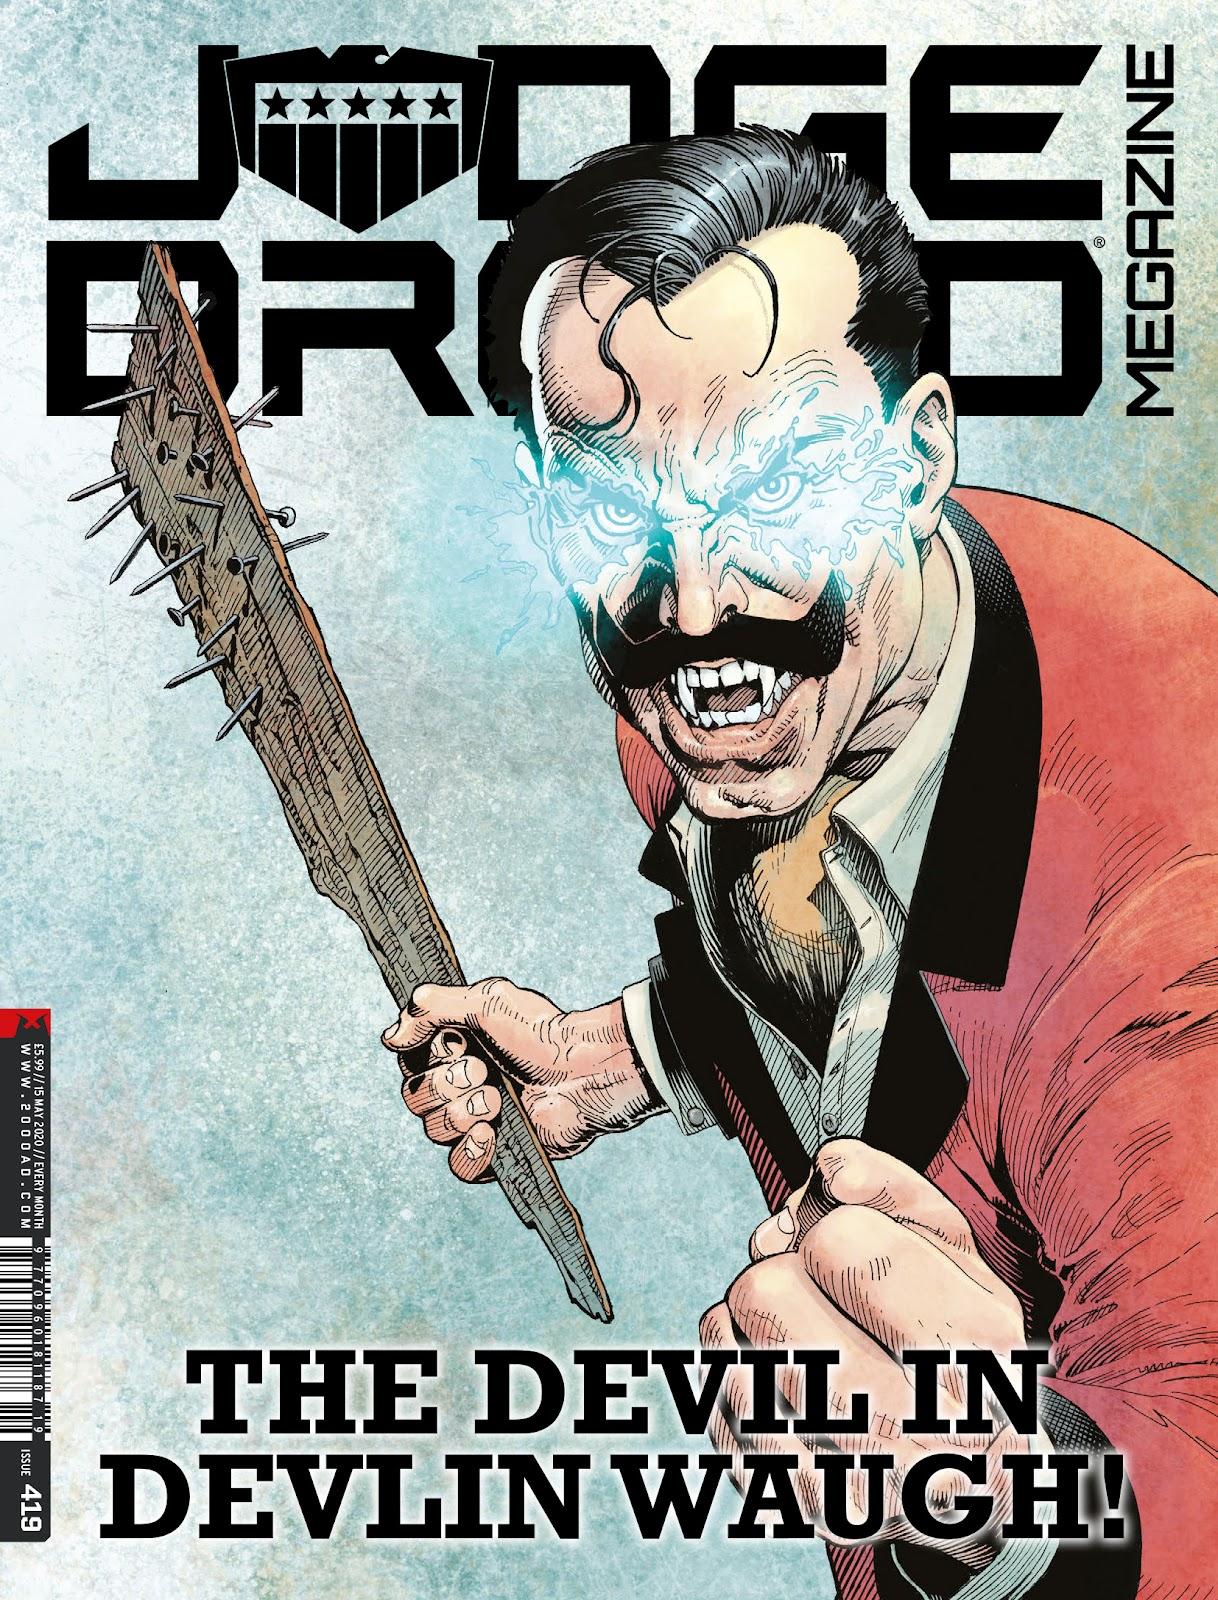 Judge Dredd Megazine (Vol. 5) issue 419 - Page 1